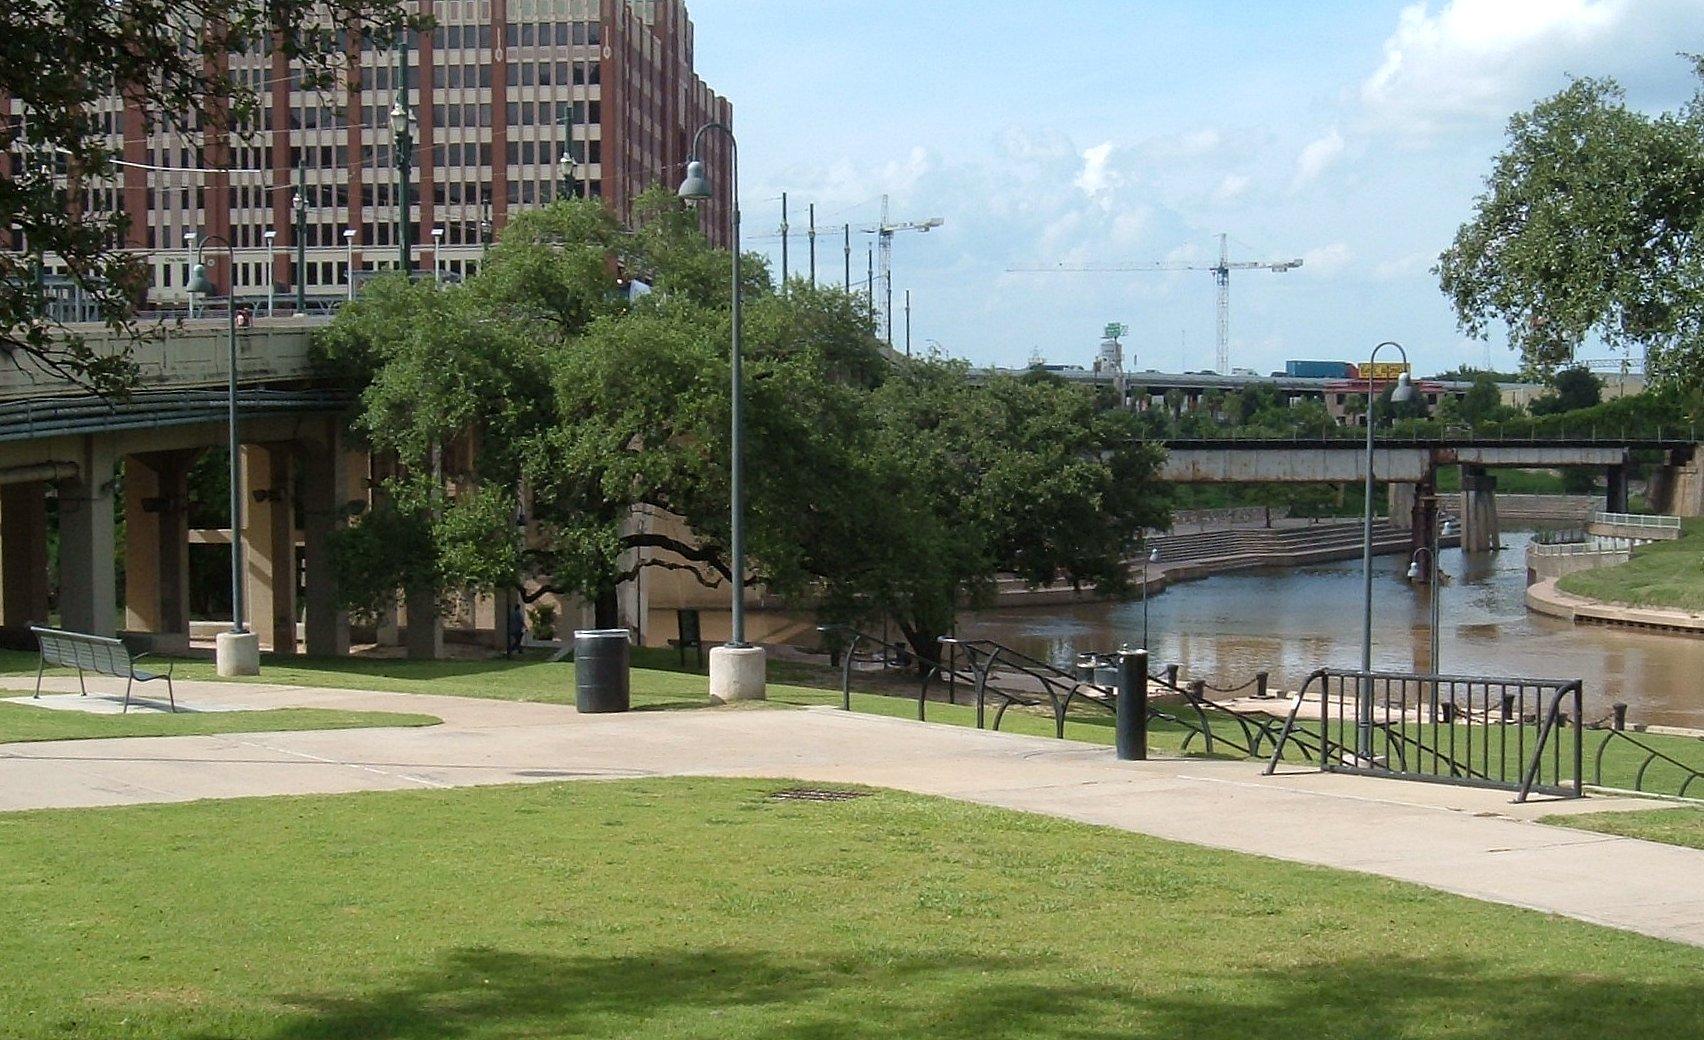 Homes for Sale in Allen TX: Dallas Suburbs Real Estate Trends